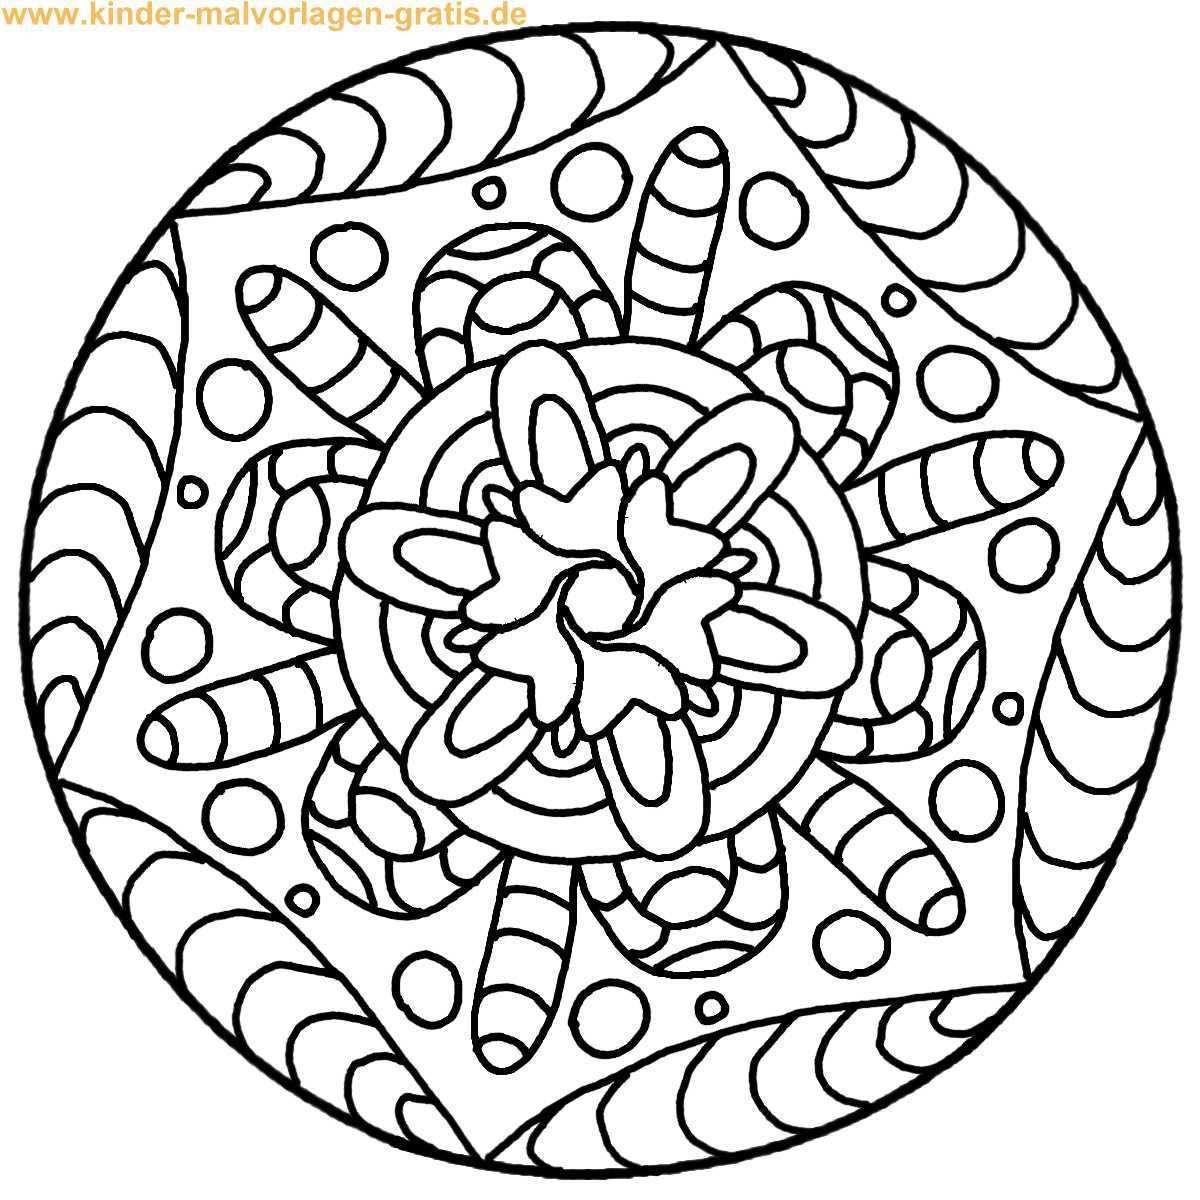 Mandalas Mandalas Zum Ausdrucken Mandalas Zum Ausmalen Kostenlose Mandalas Mandala Coloring Pages Mandala Coloring Coloring Pages For Girls